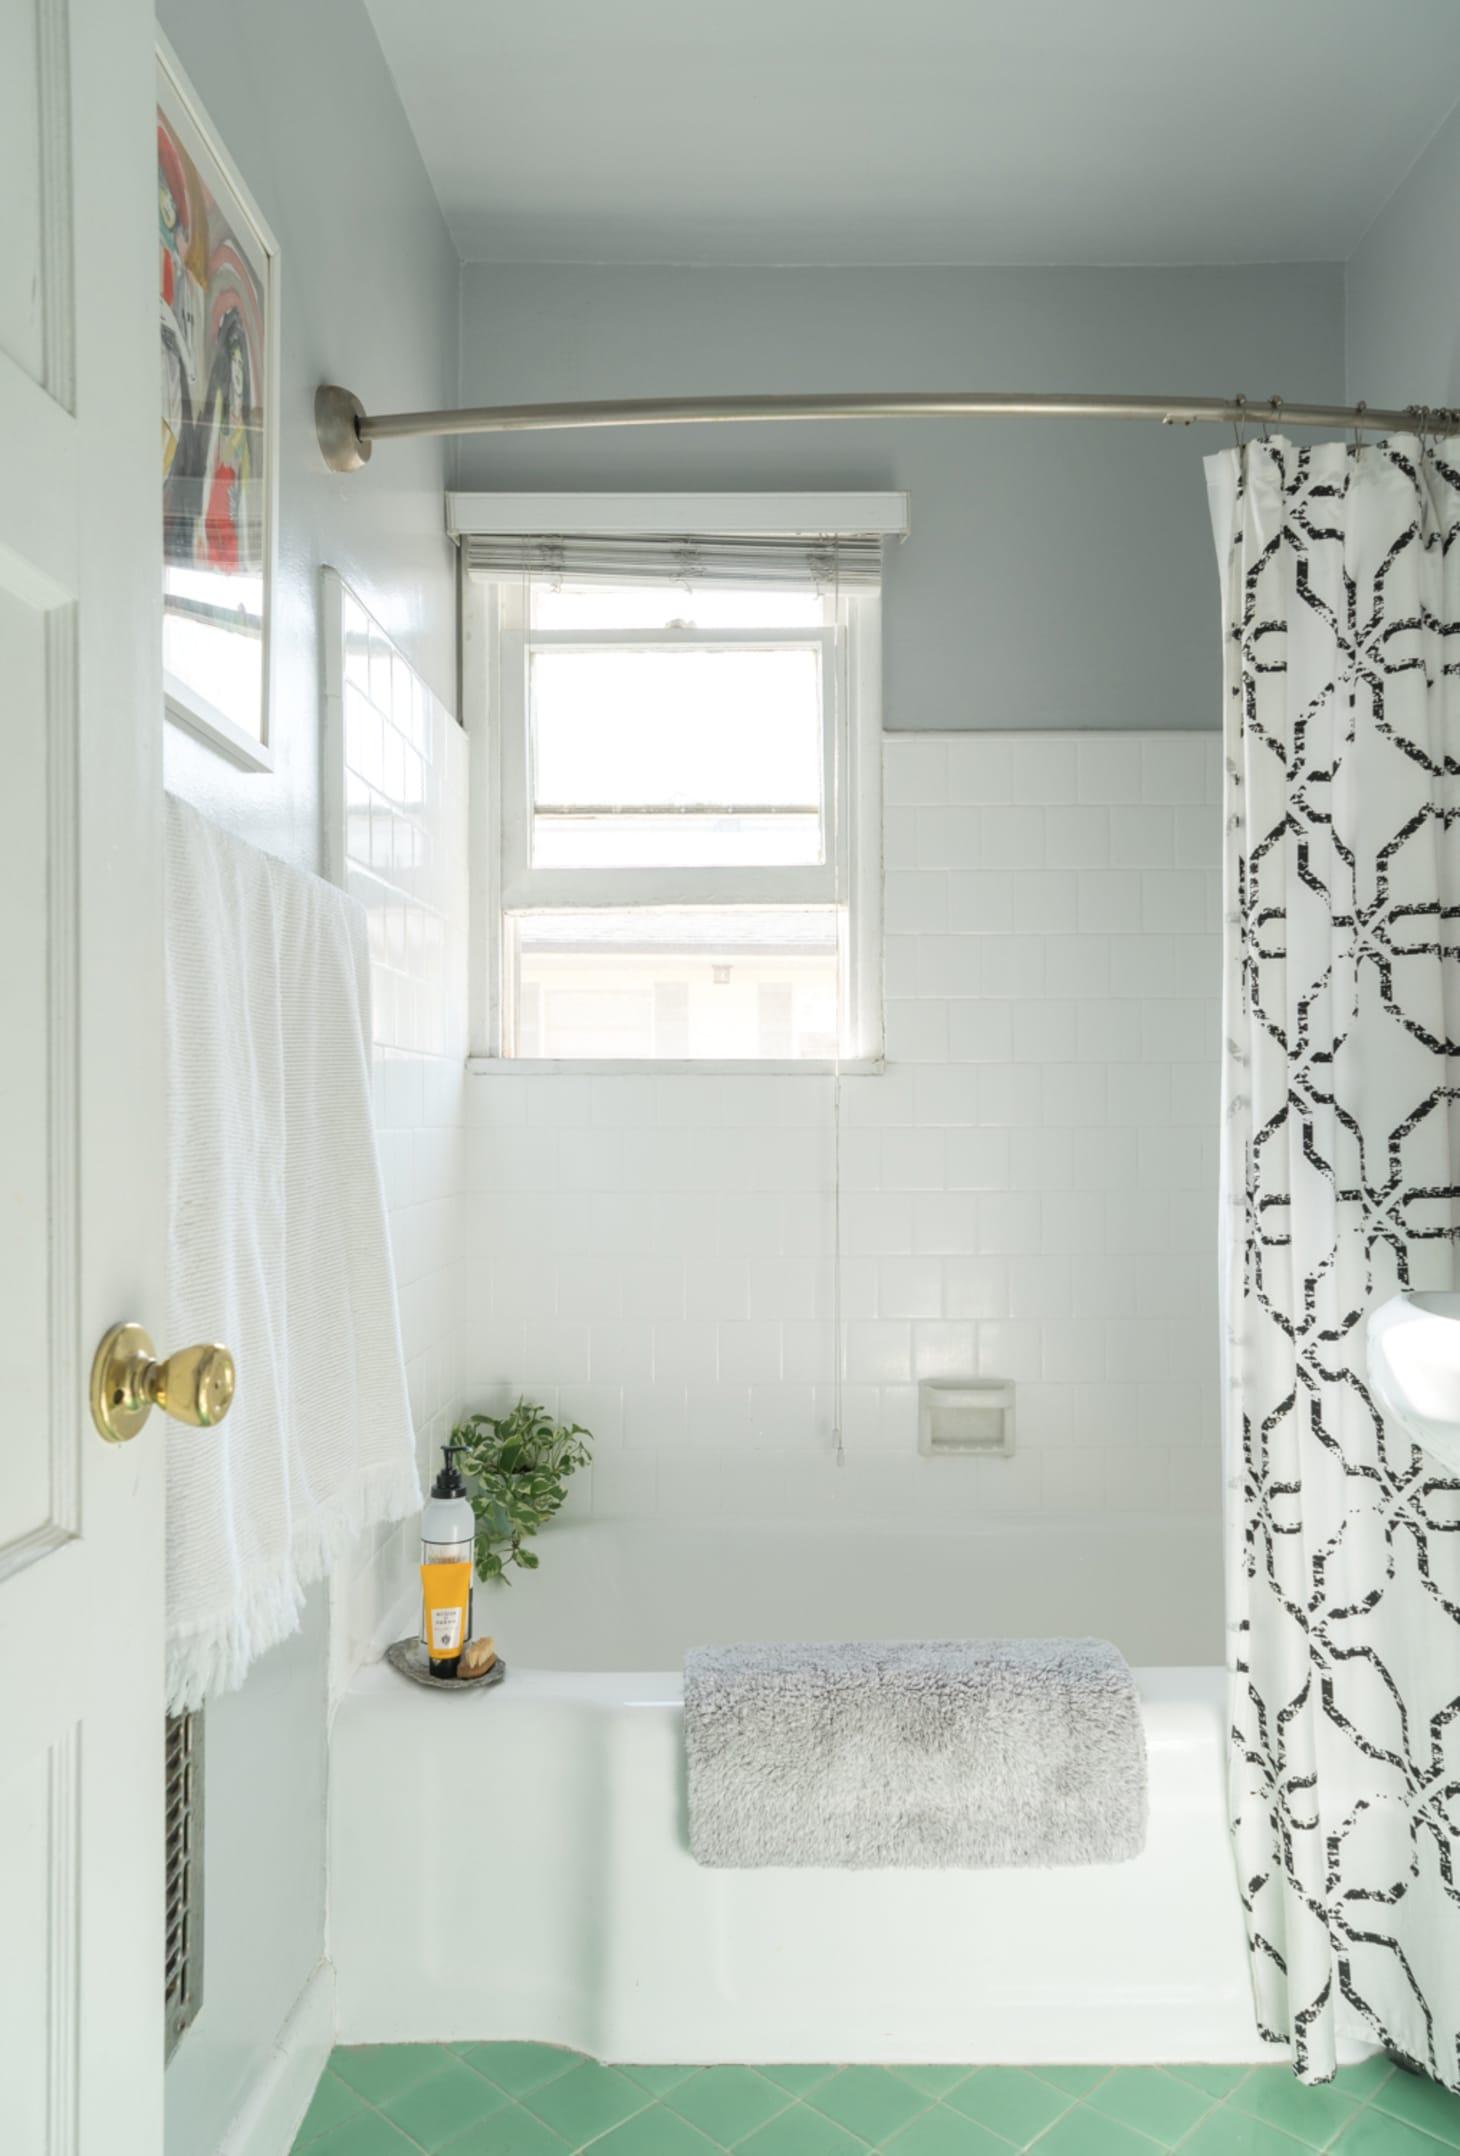 25 Small Bathroom Storage & Design Ideas - Storage ... on Small Apartment Bathroom  id=74705